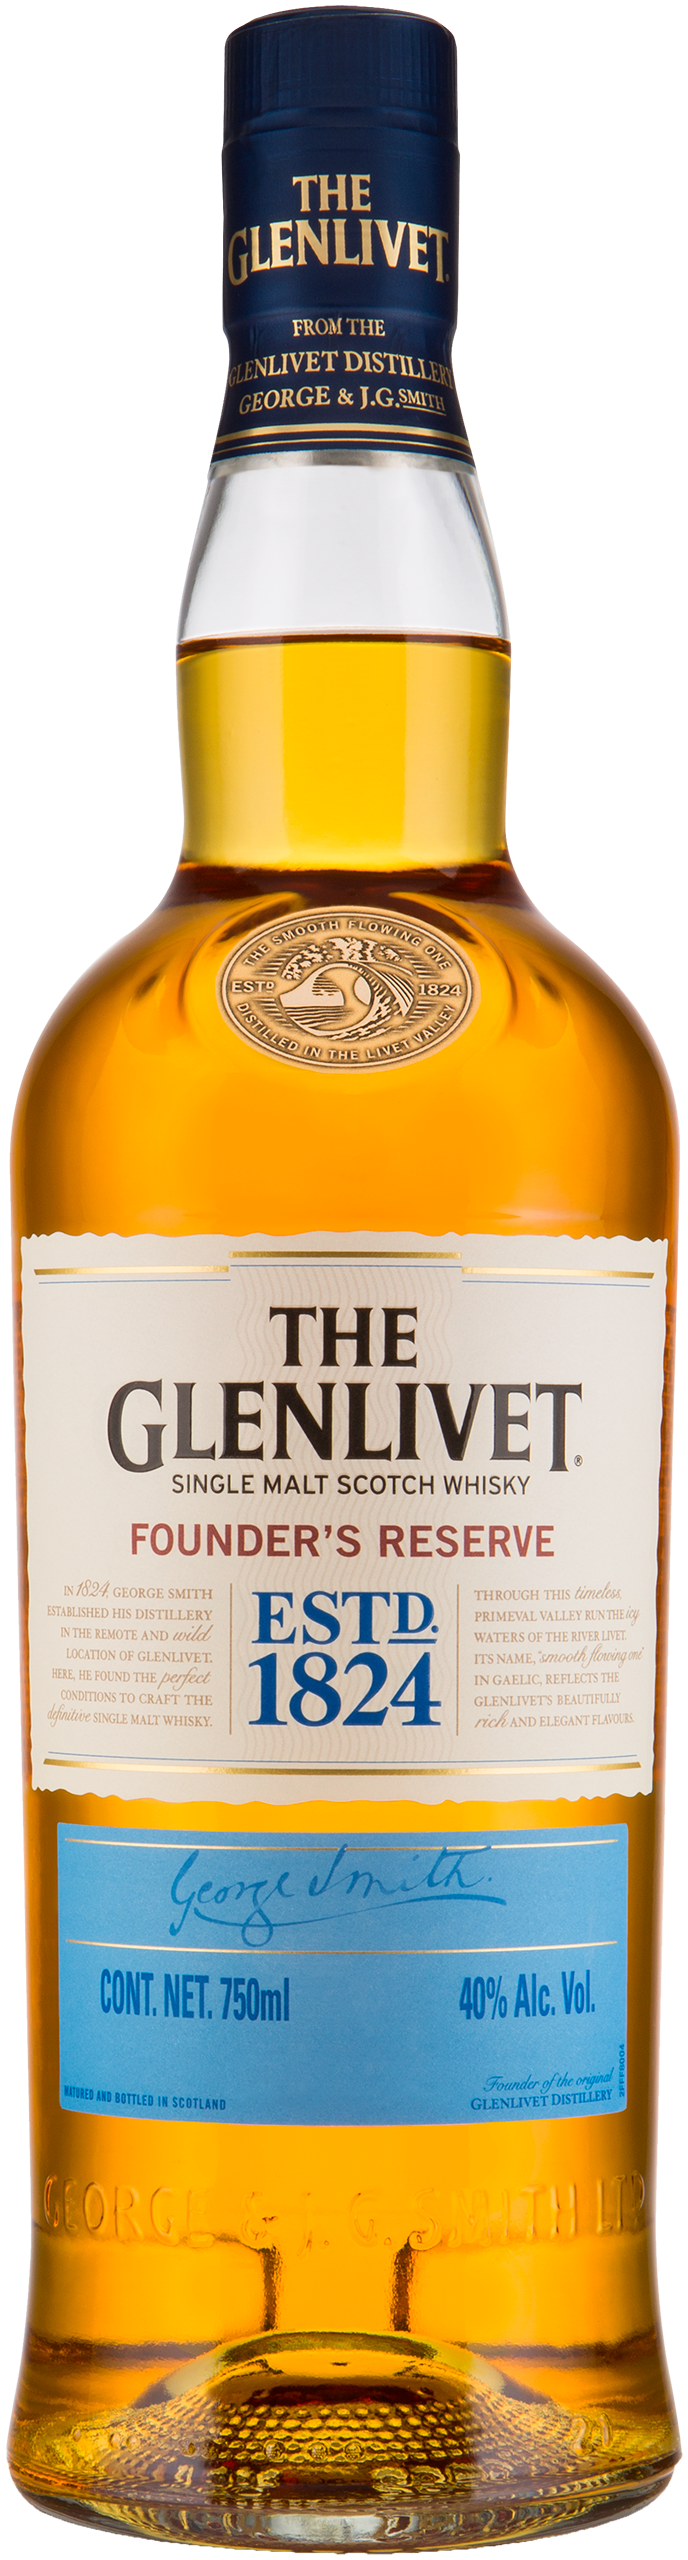 packshot the glenlivet